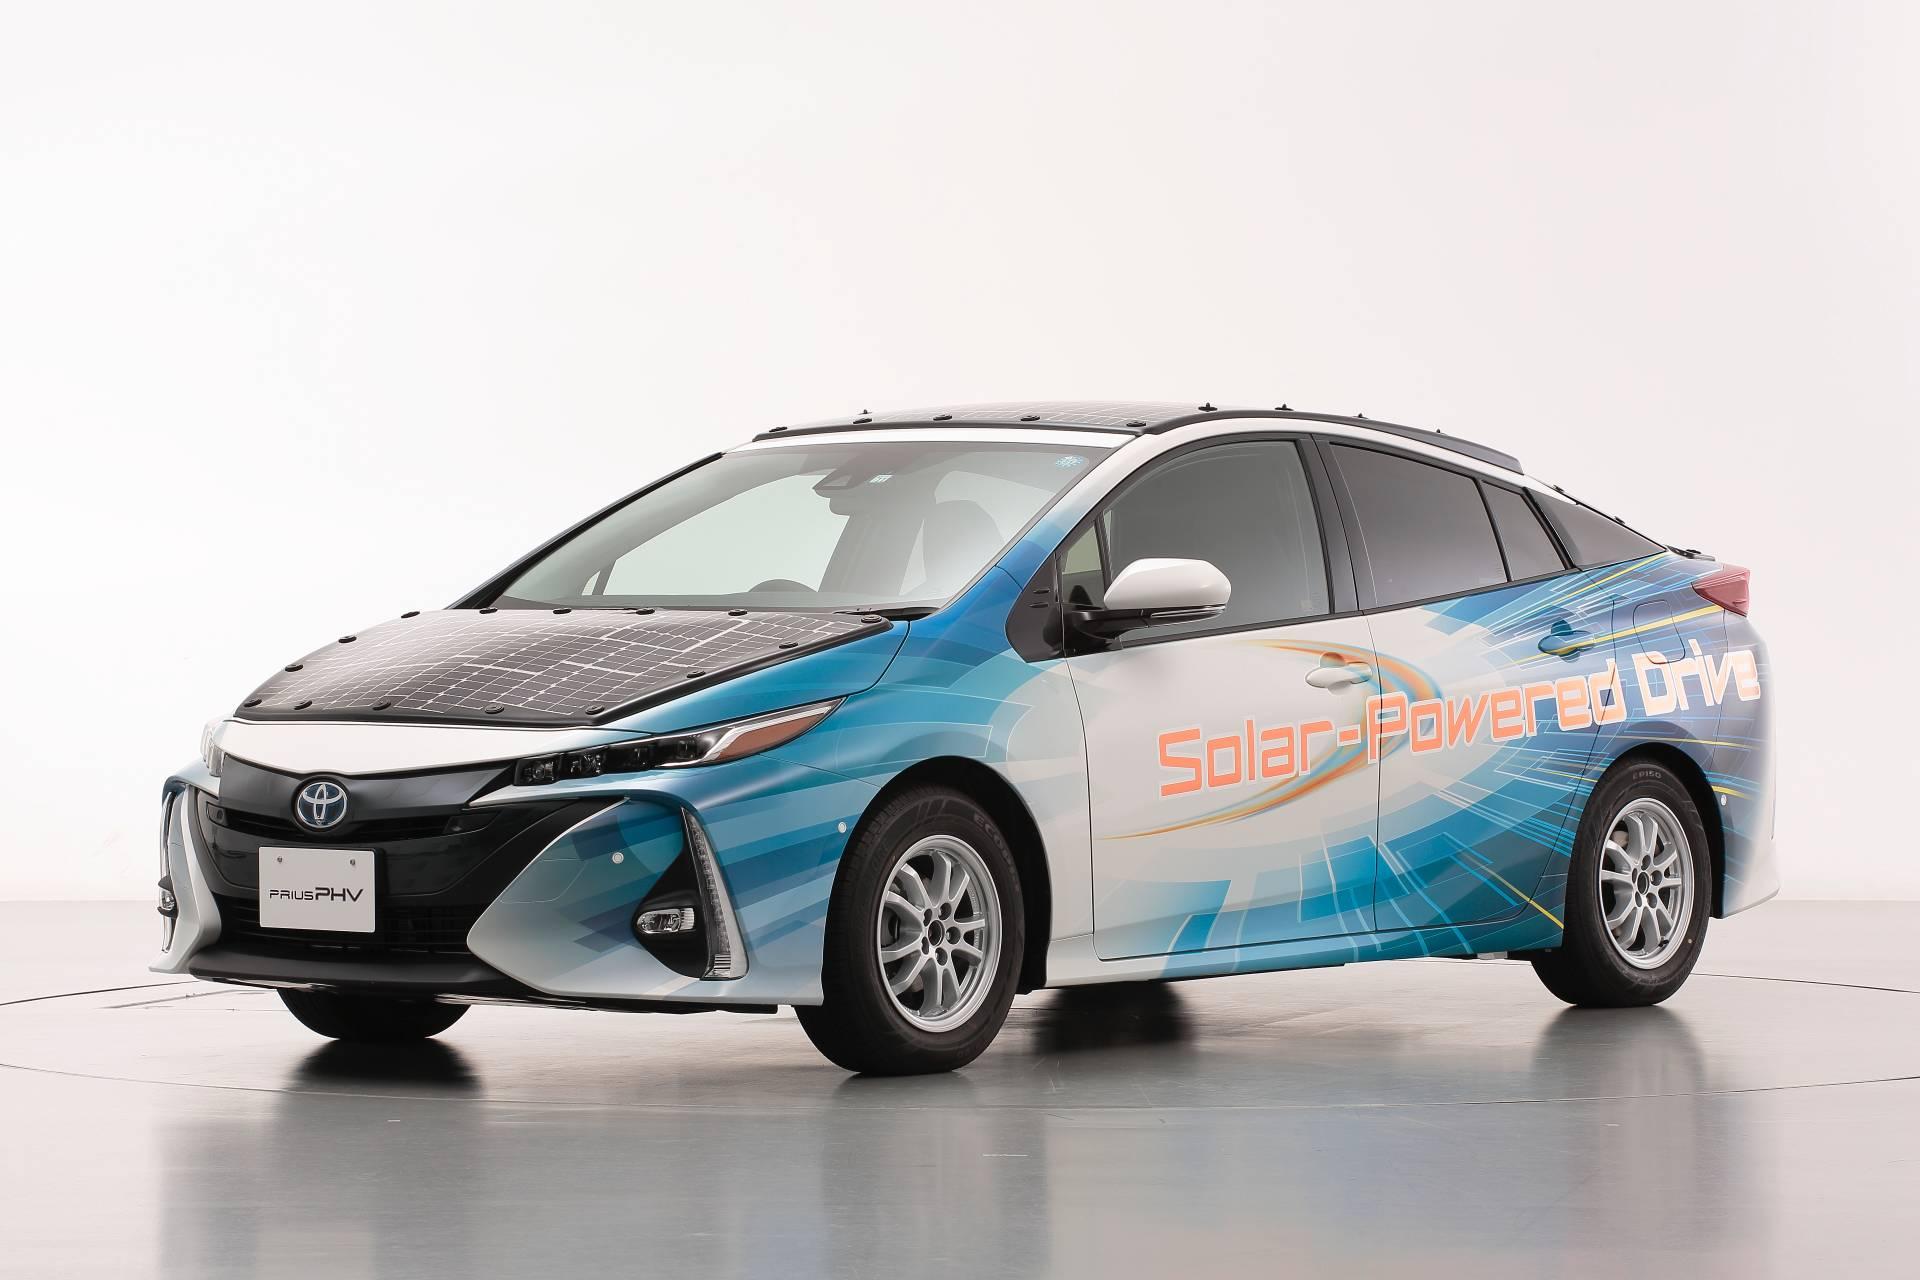 Toyota-Prius-Prime-With-Solar-Panels-3